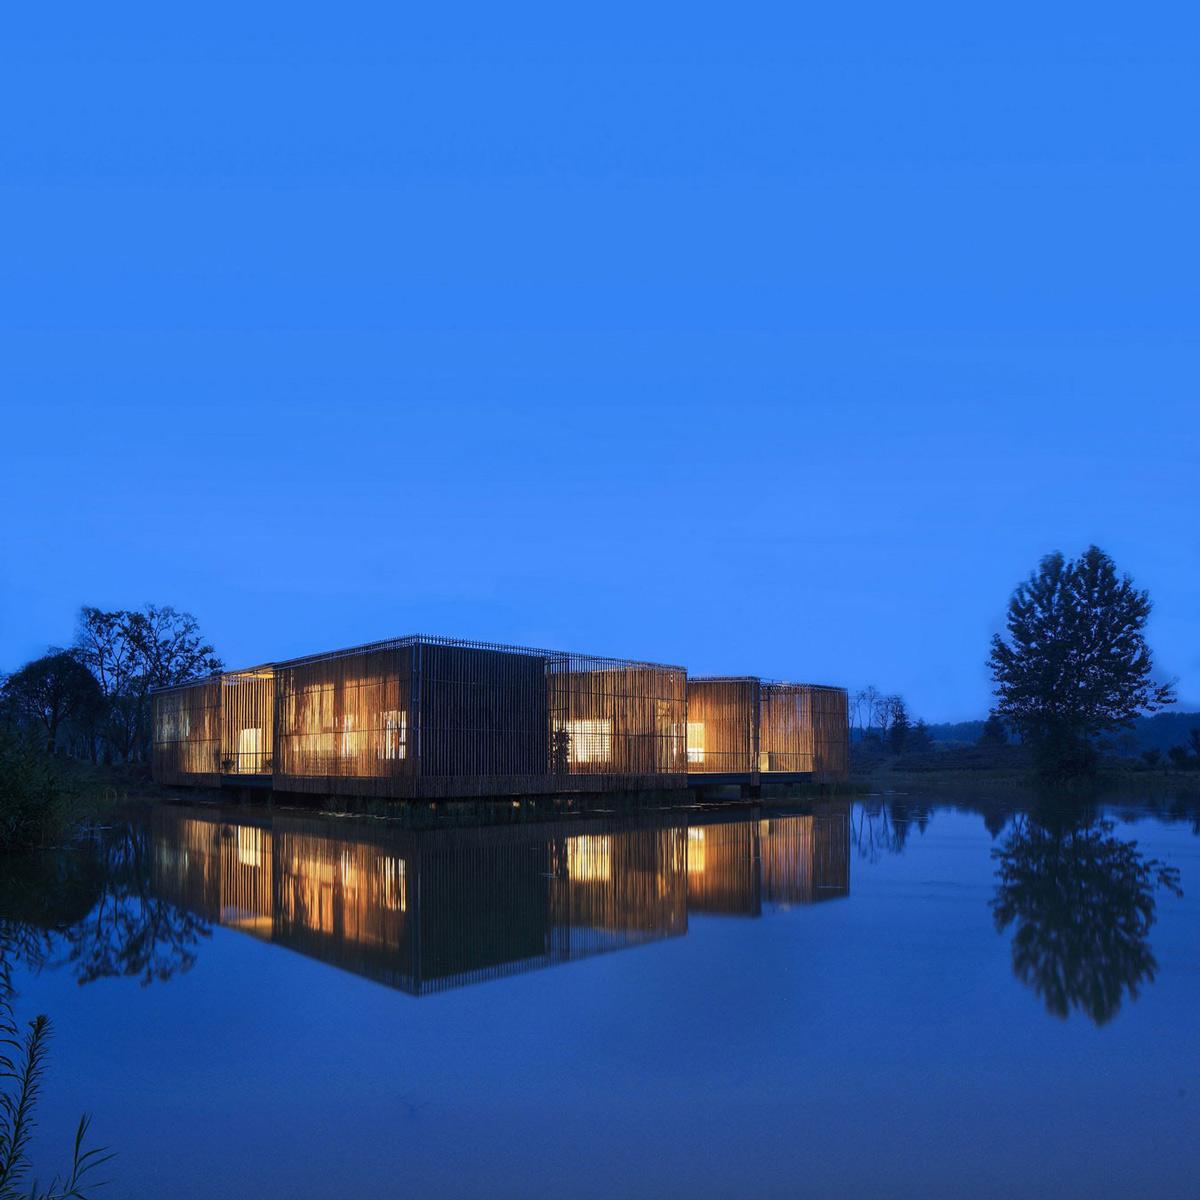 Dusk, Lake, Lighting, Floating Bamboo Courtyard Teahouse in ShiQiao, China